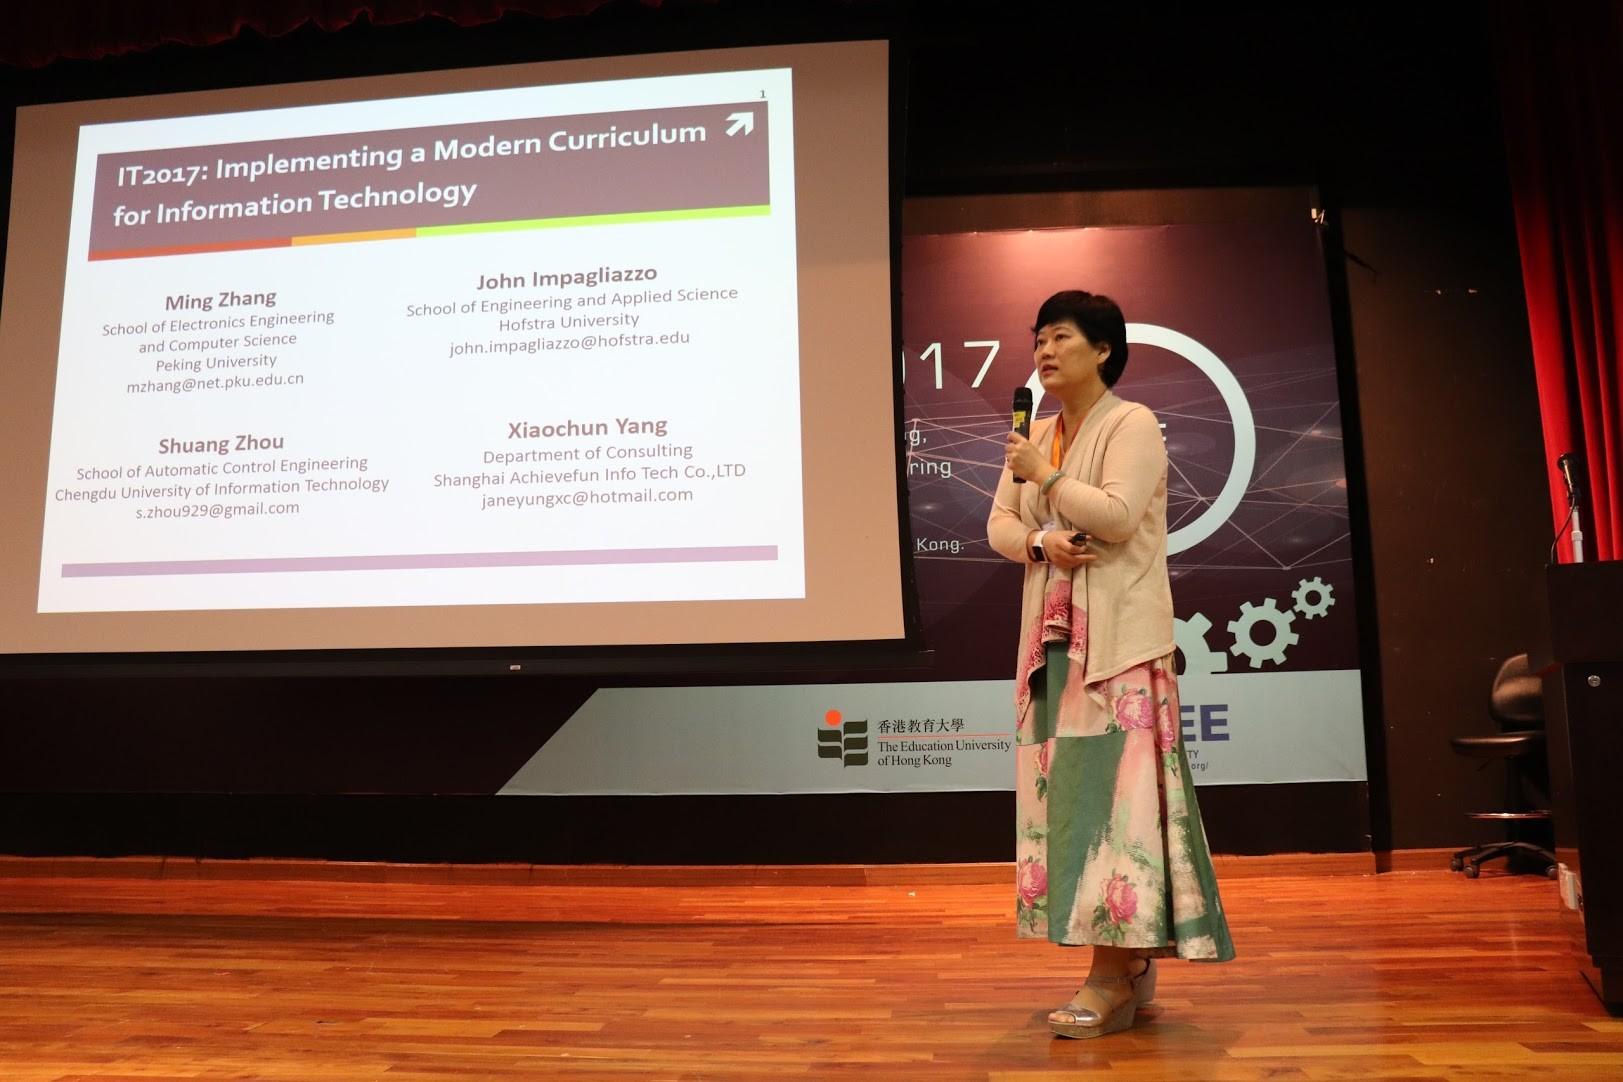 ACM China SIGCSE Chapter